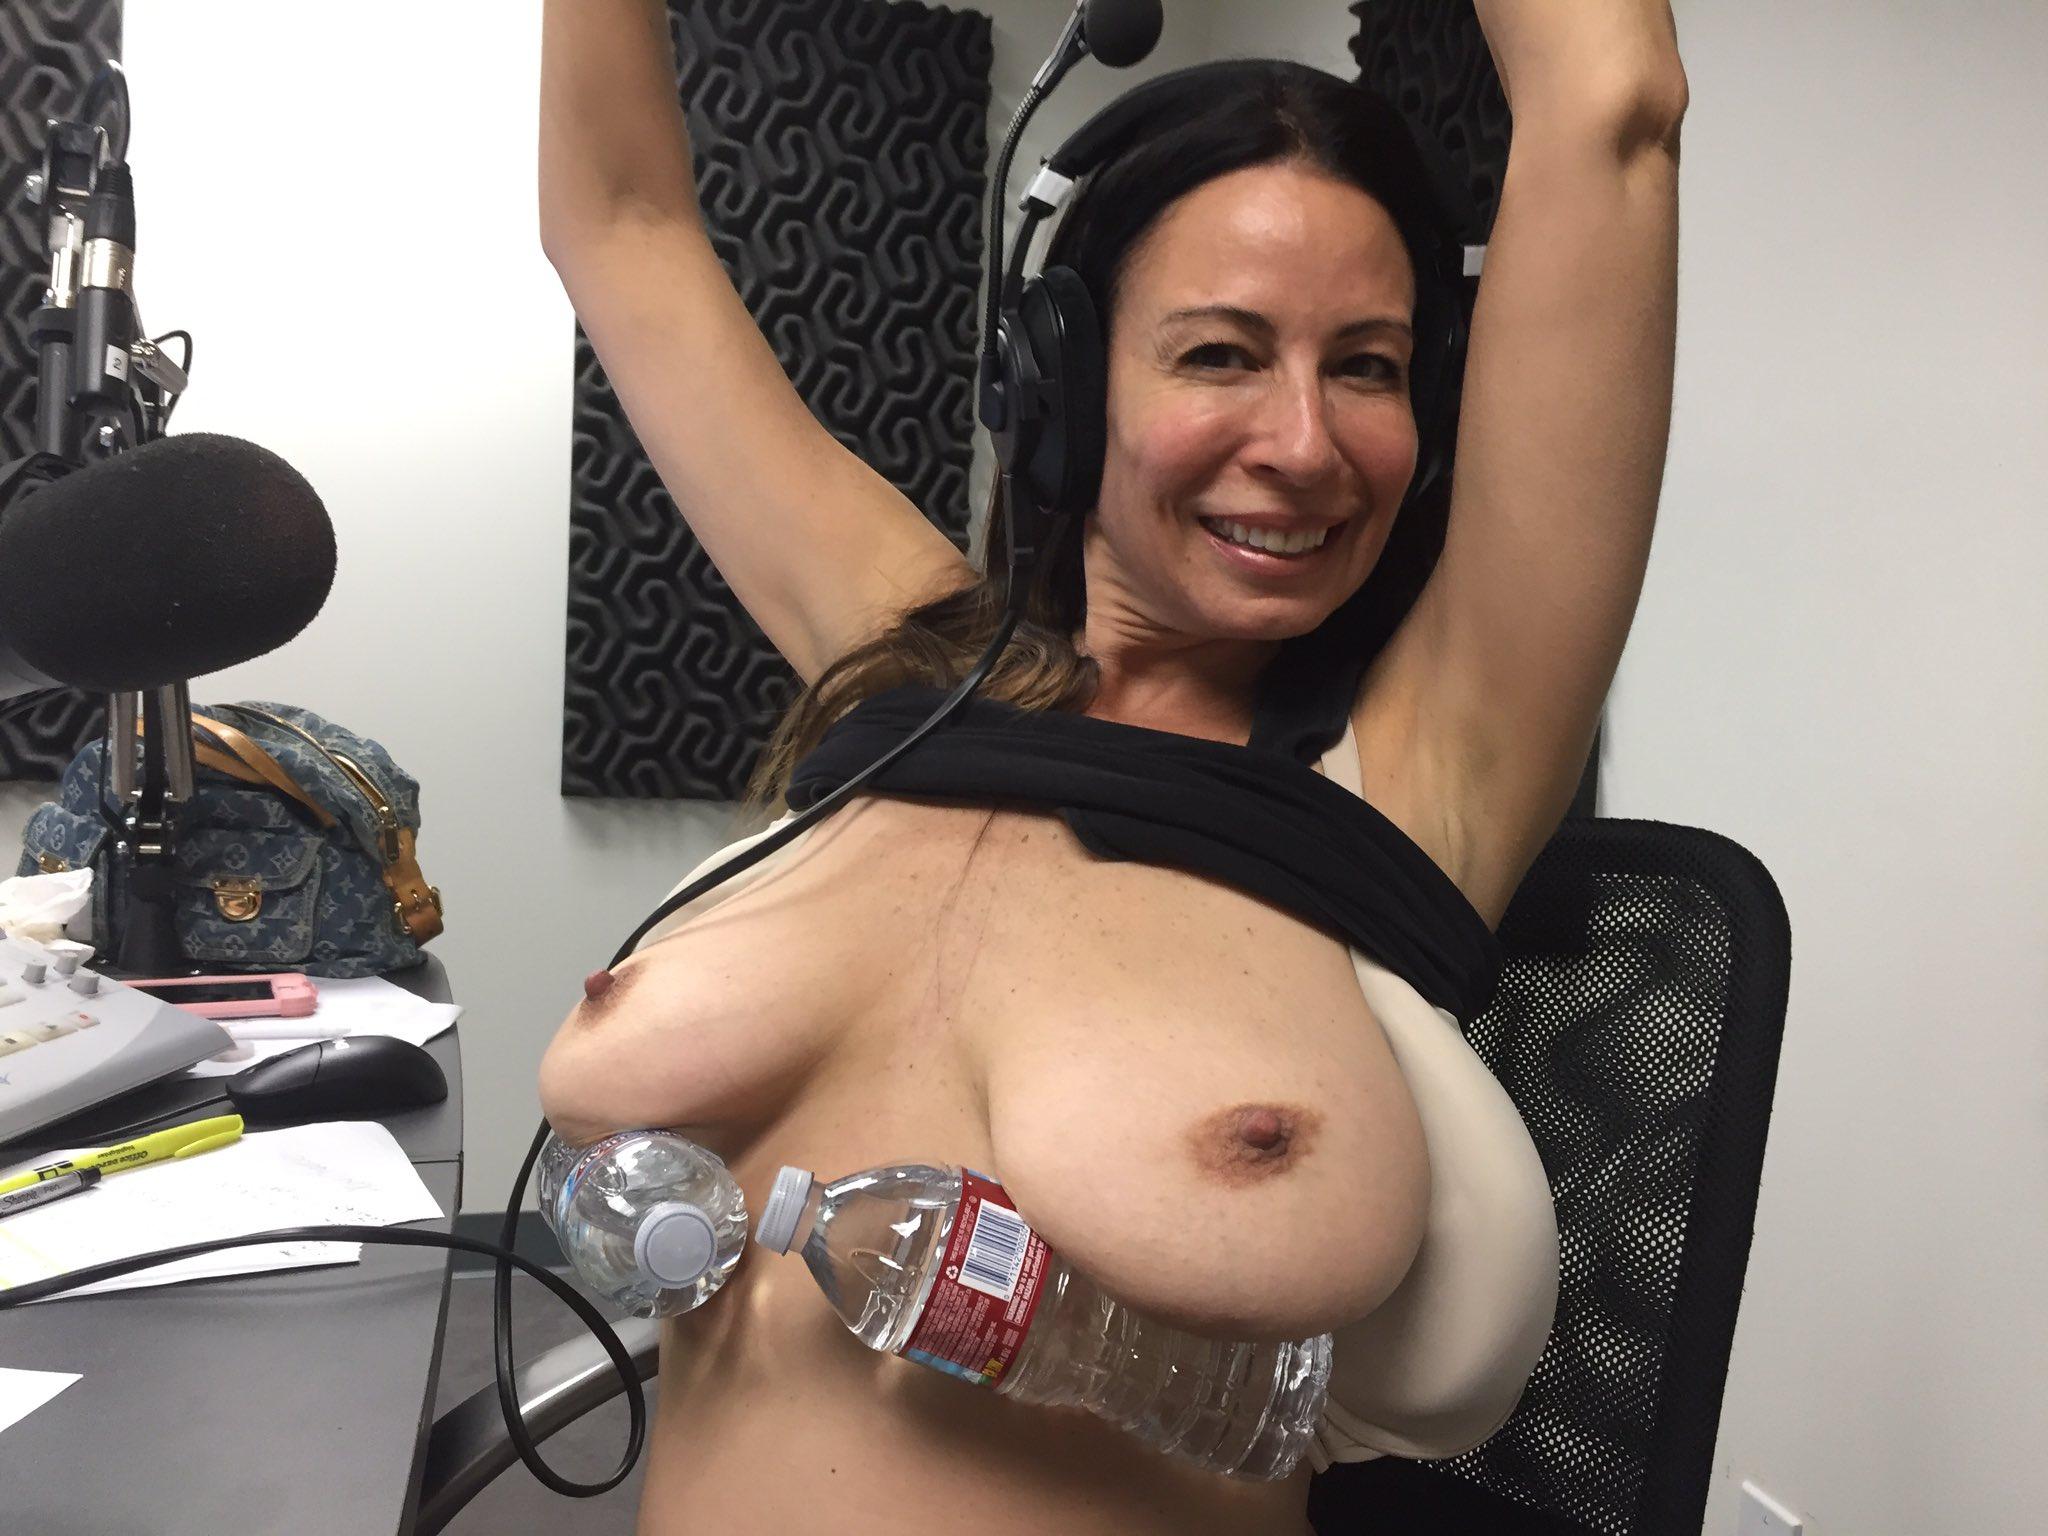 tw pornstars pic alex chance twitter holding water